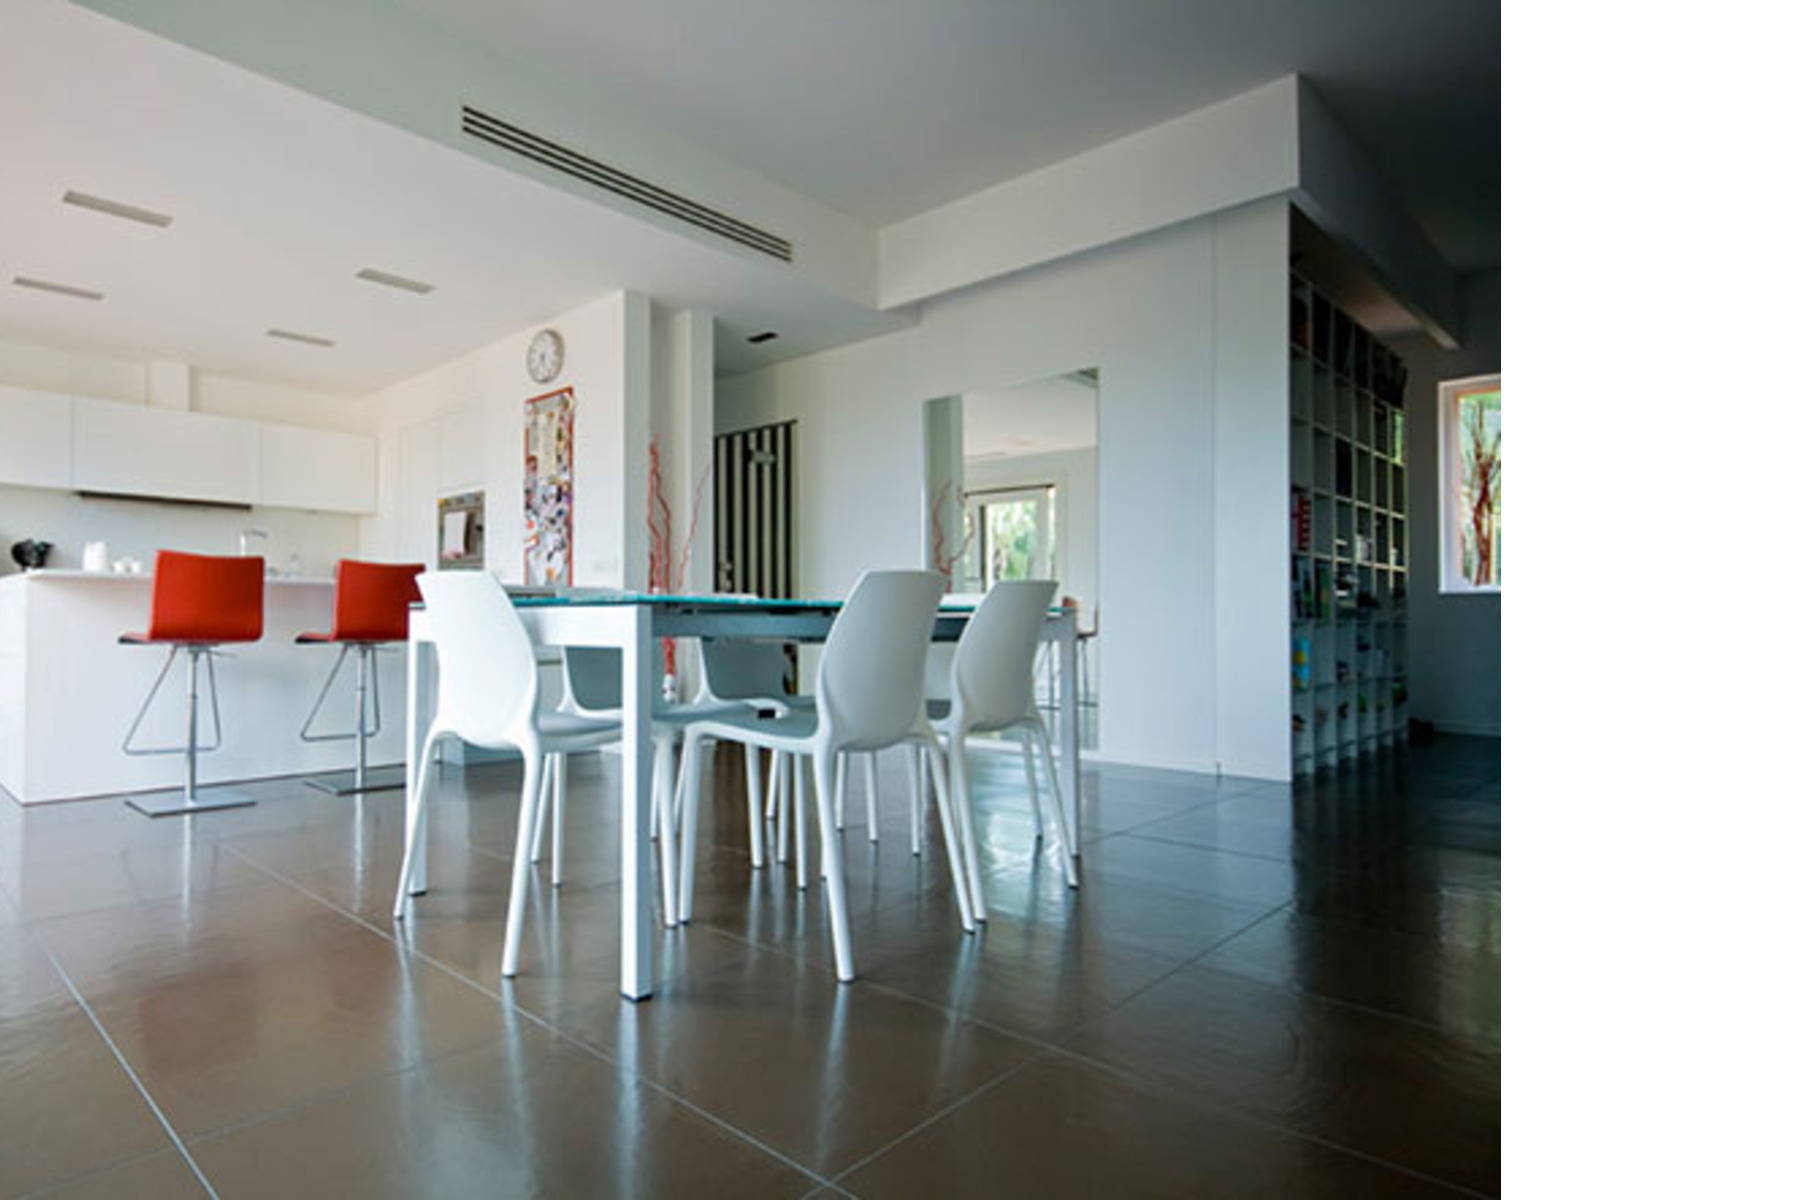 L arredamento d interni in cinque punti floornature